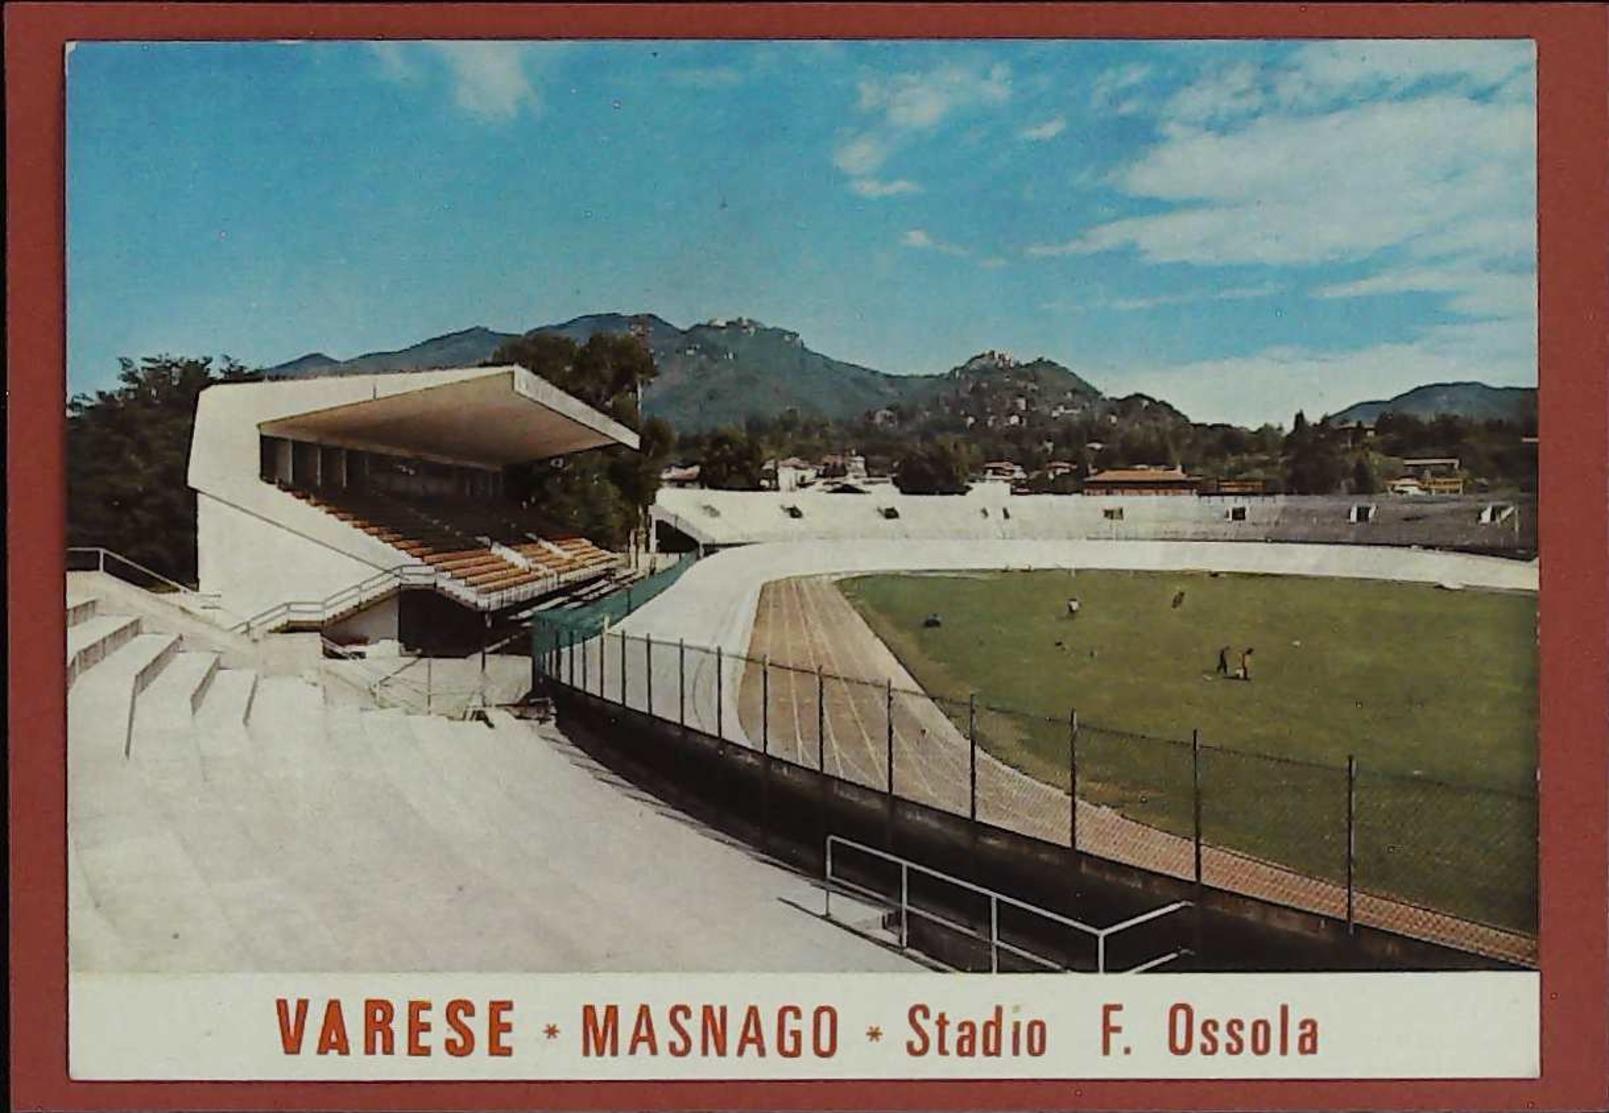 06 VARESE STADIO OSSOLA- ESTADIO – STADION – STADE – STADIUM – CAMPO SPORTIVO - Estadios